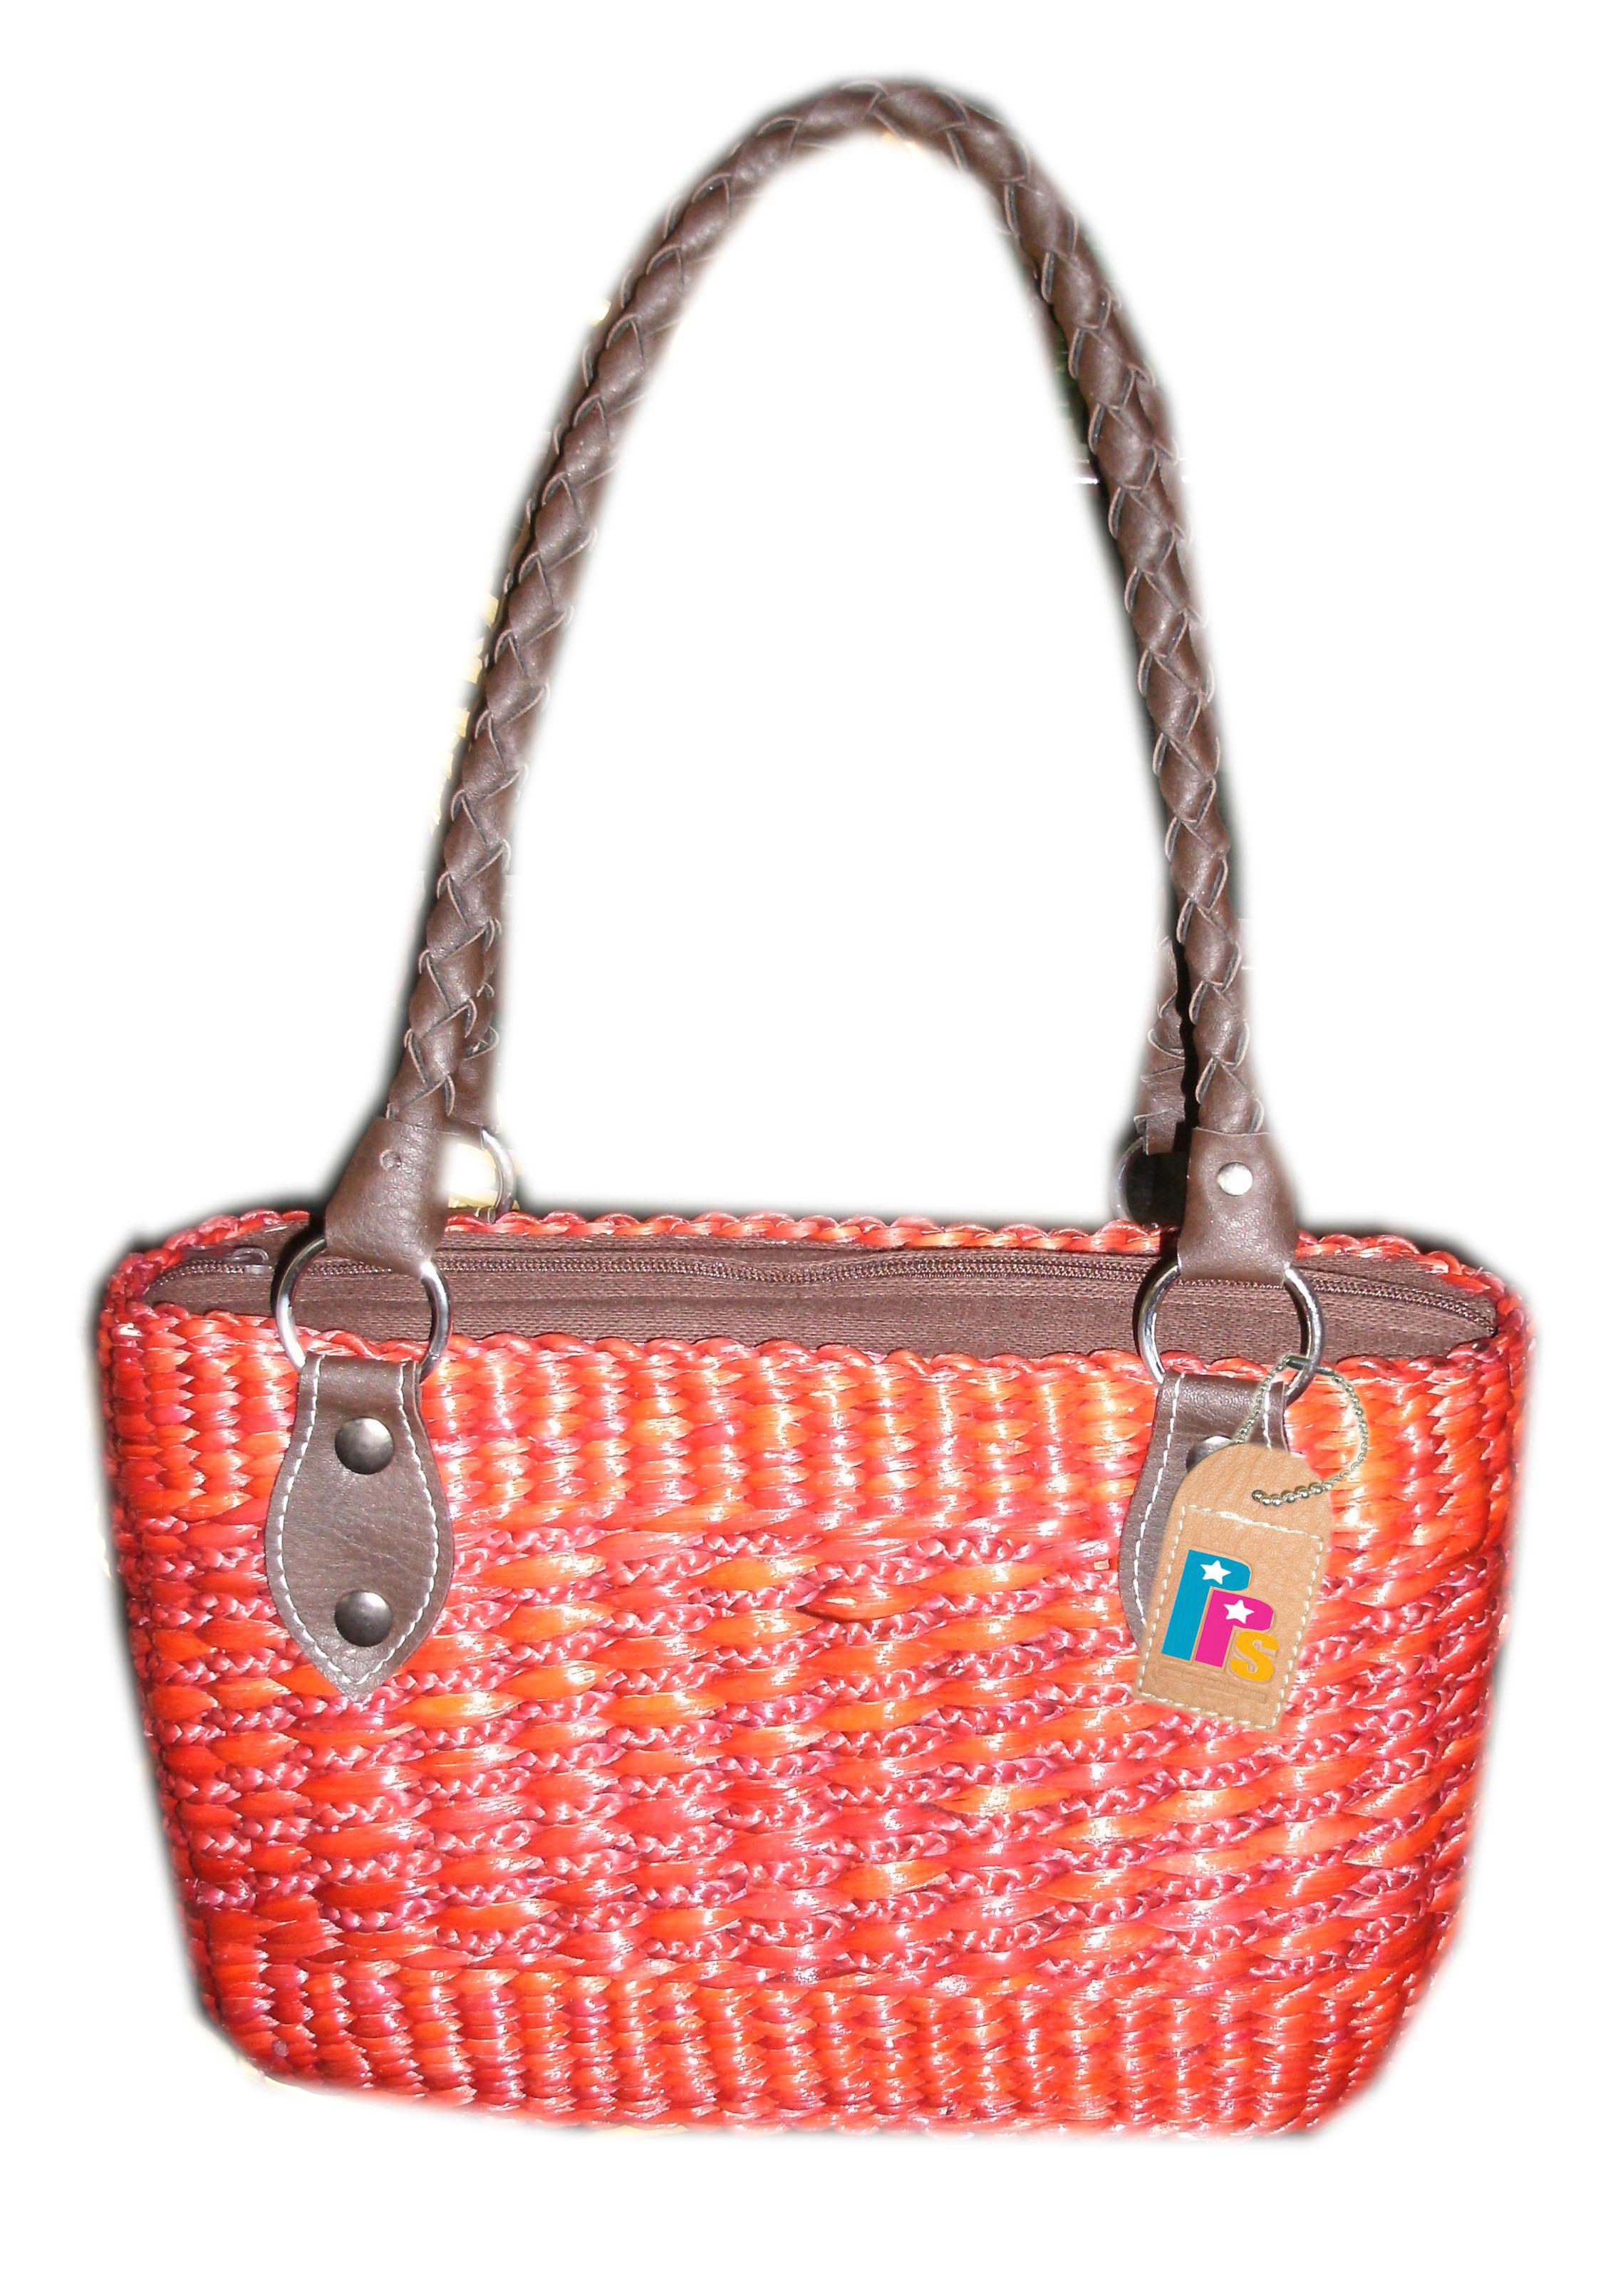 PPS-HyacinthBag1987